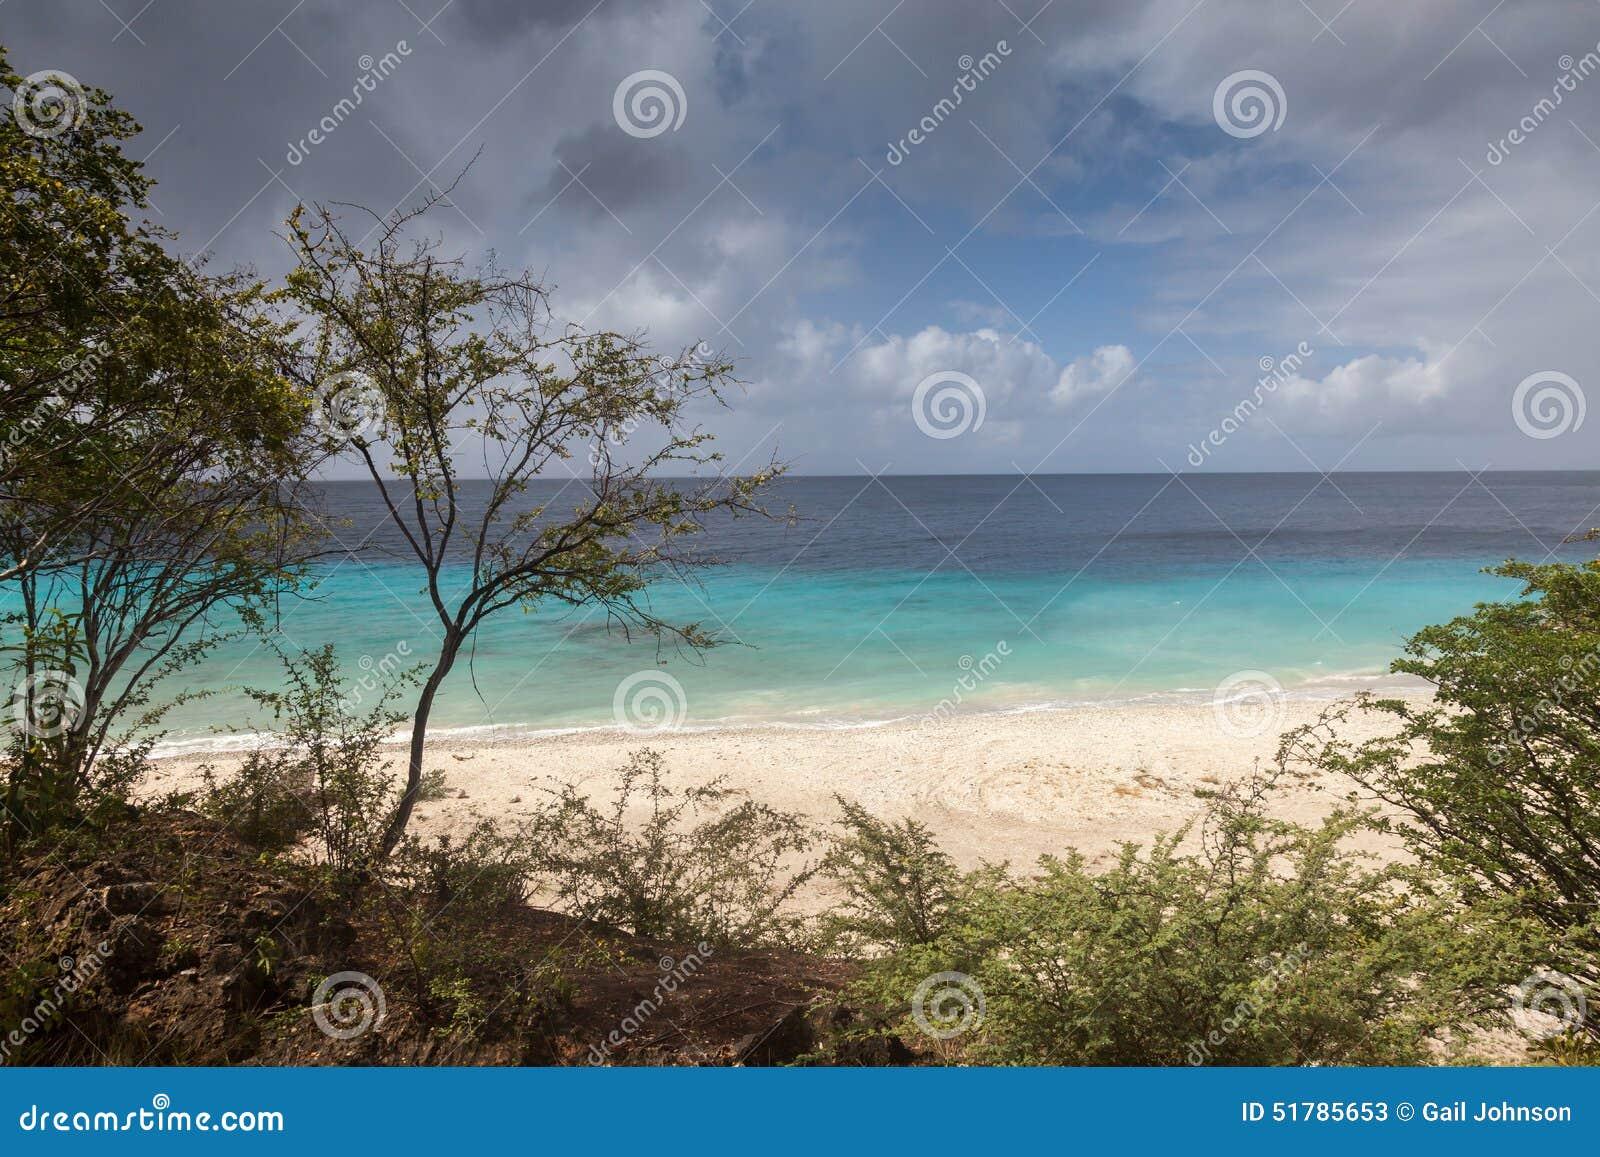 Overzees - Meningen rond Curacao Caraïbisch eiland